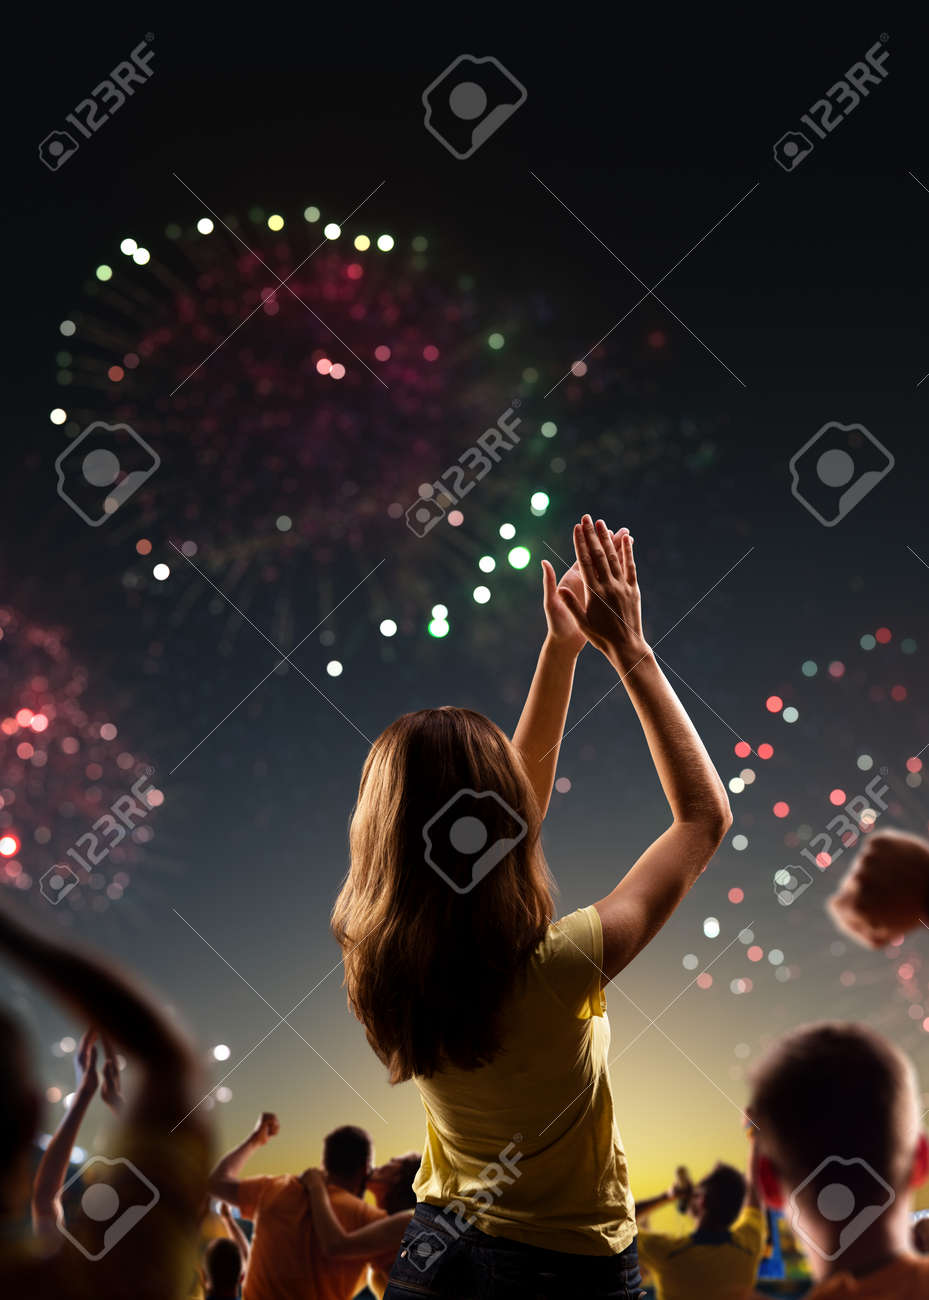 Fans celebrate in Stadium Arena night fireworks - 157252344